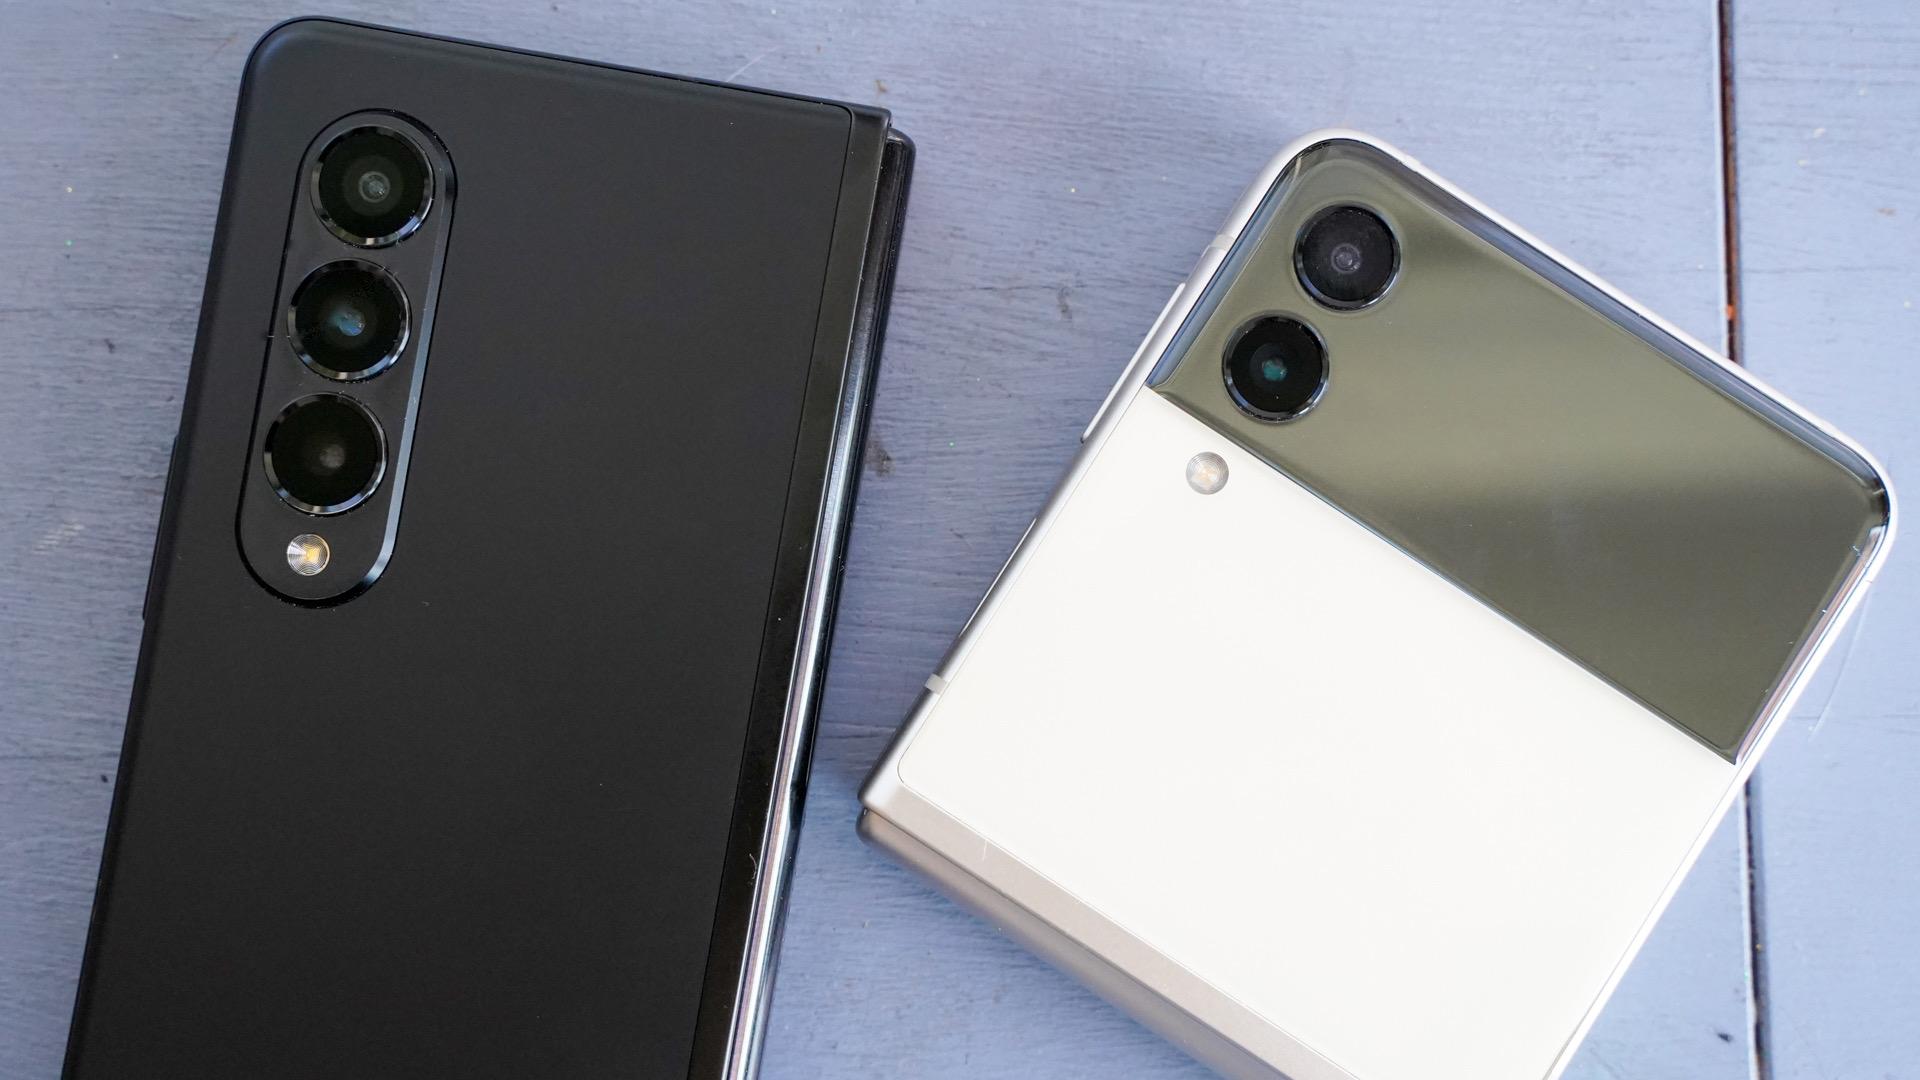 Samsung Galaxy Z Fold vs Z Flip camera closeup 3